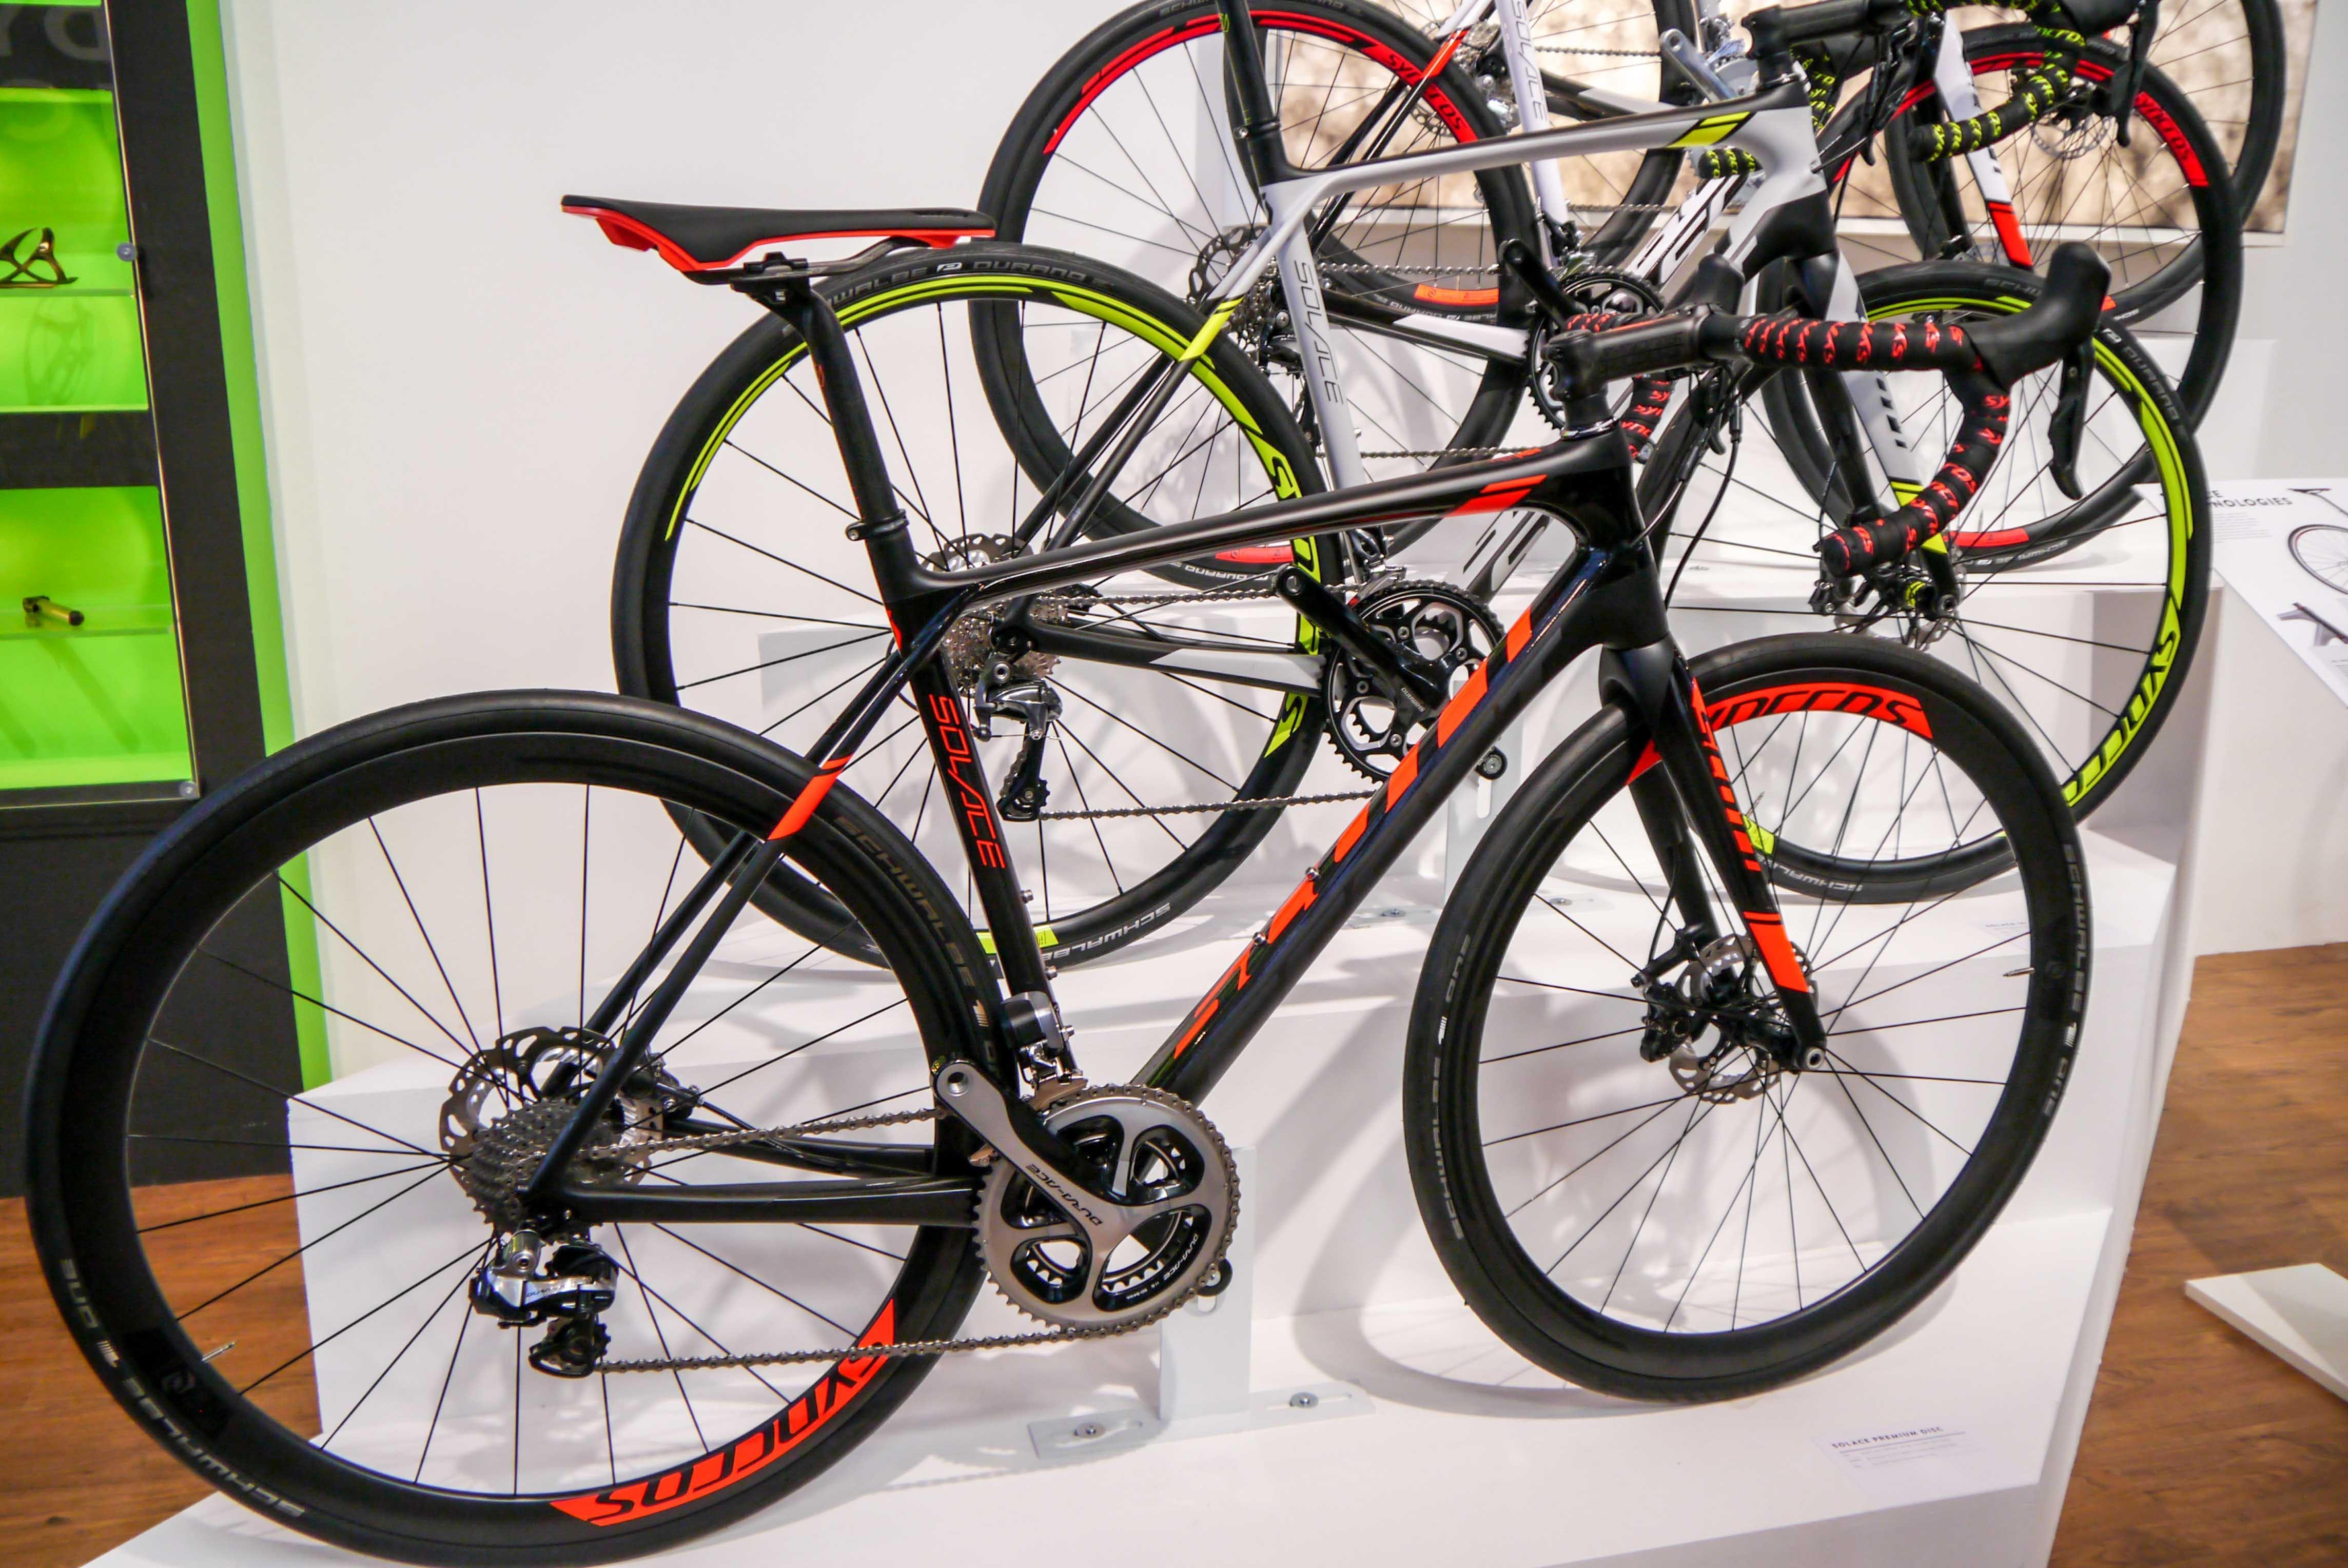 Scott Solace 2016 road bike